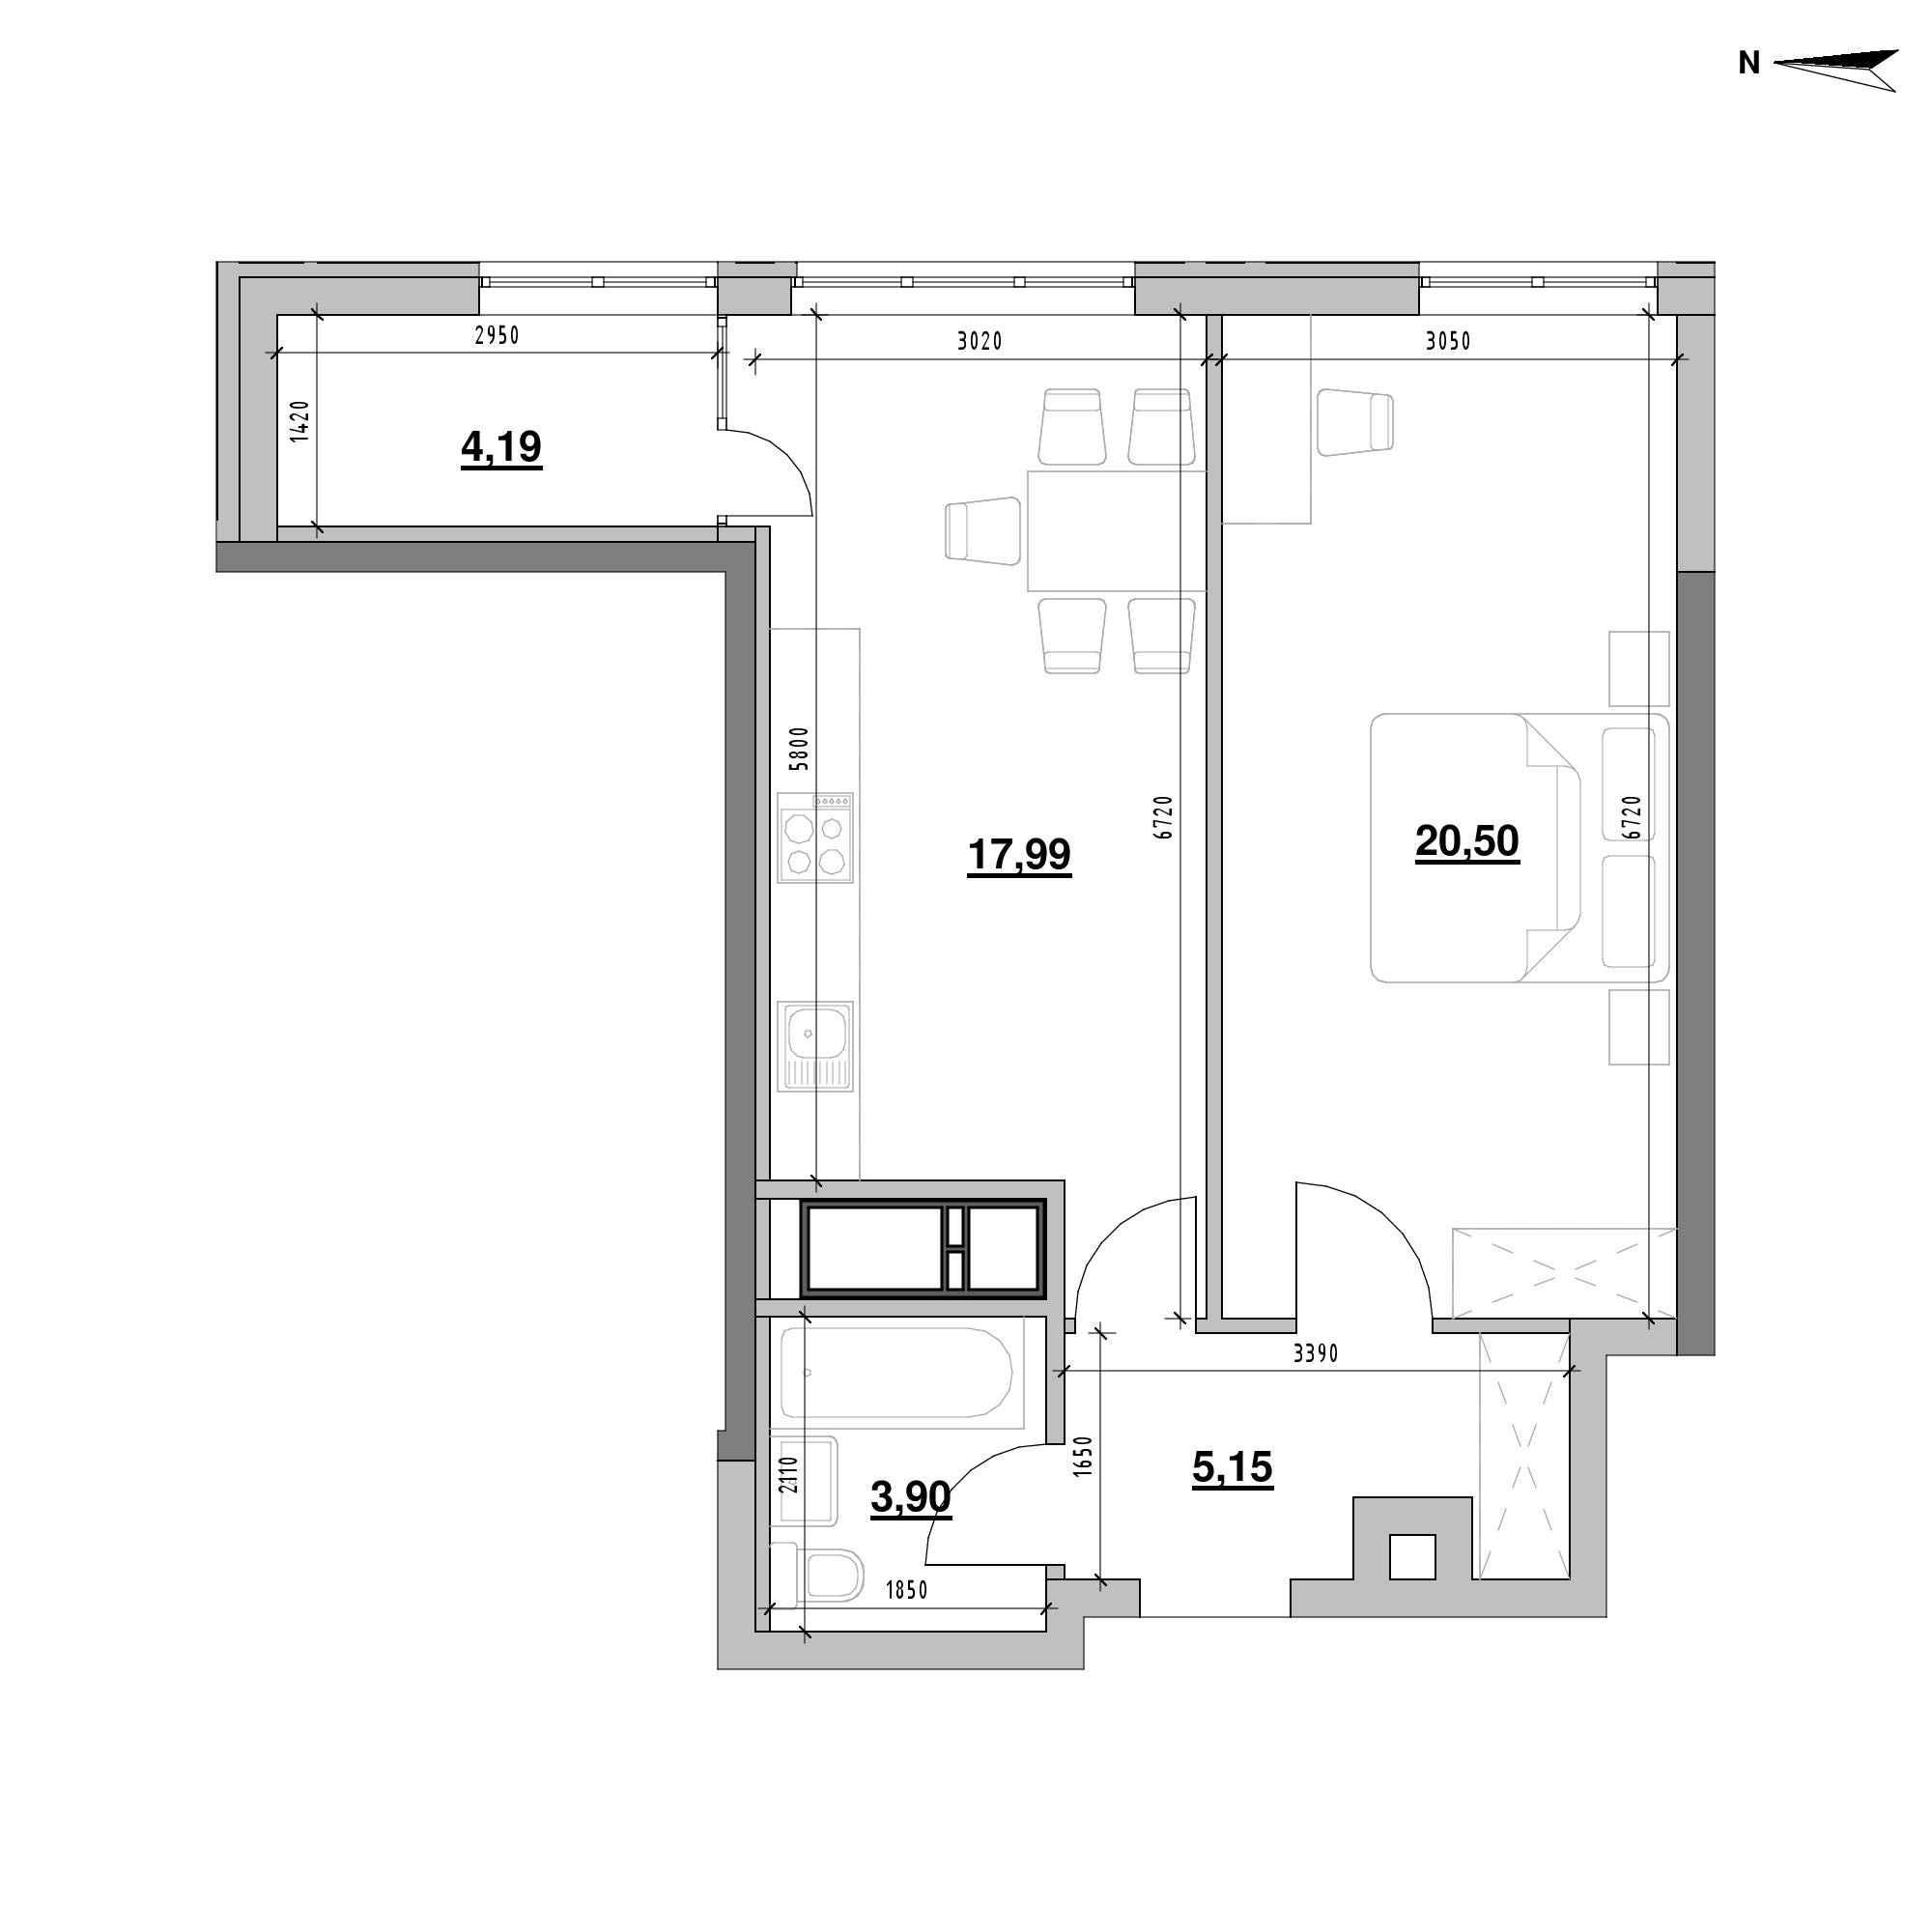 ЖК Nordica Residence: планування 1-кімнатної квартири, №172, 51.59 м<sup>2</sup>